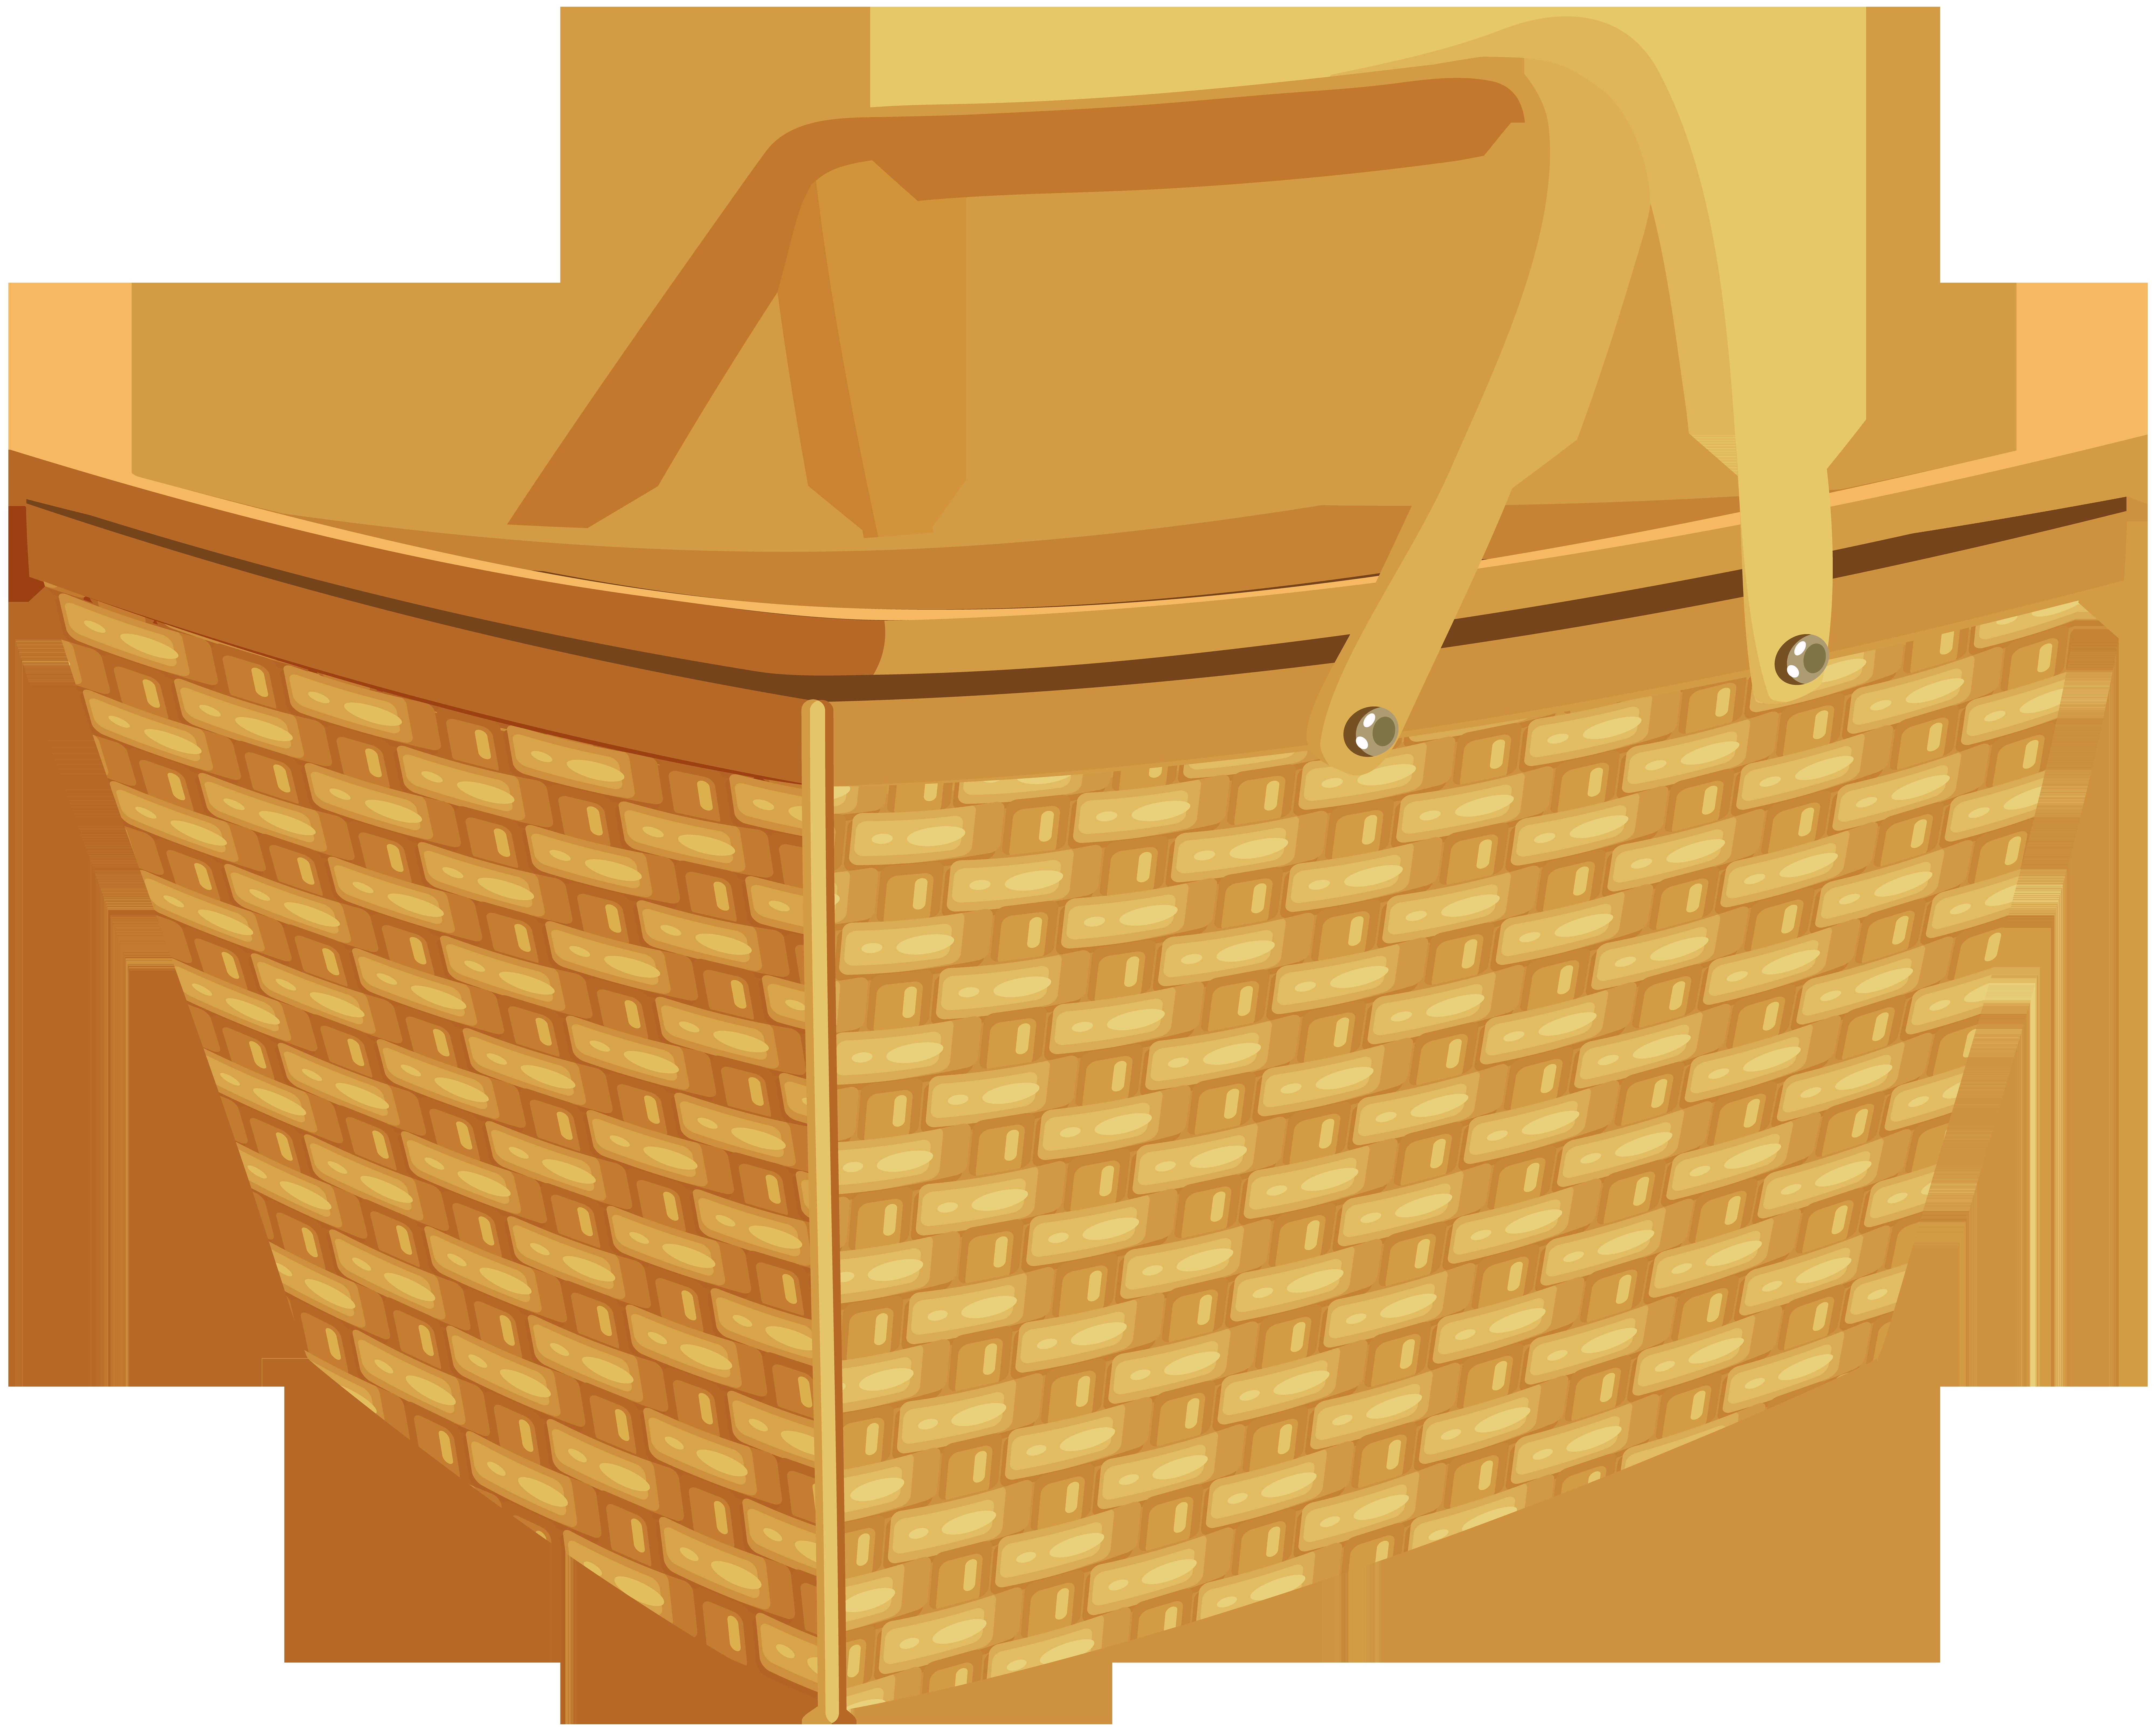 Picnic png clip art. Movies clipart basket